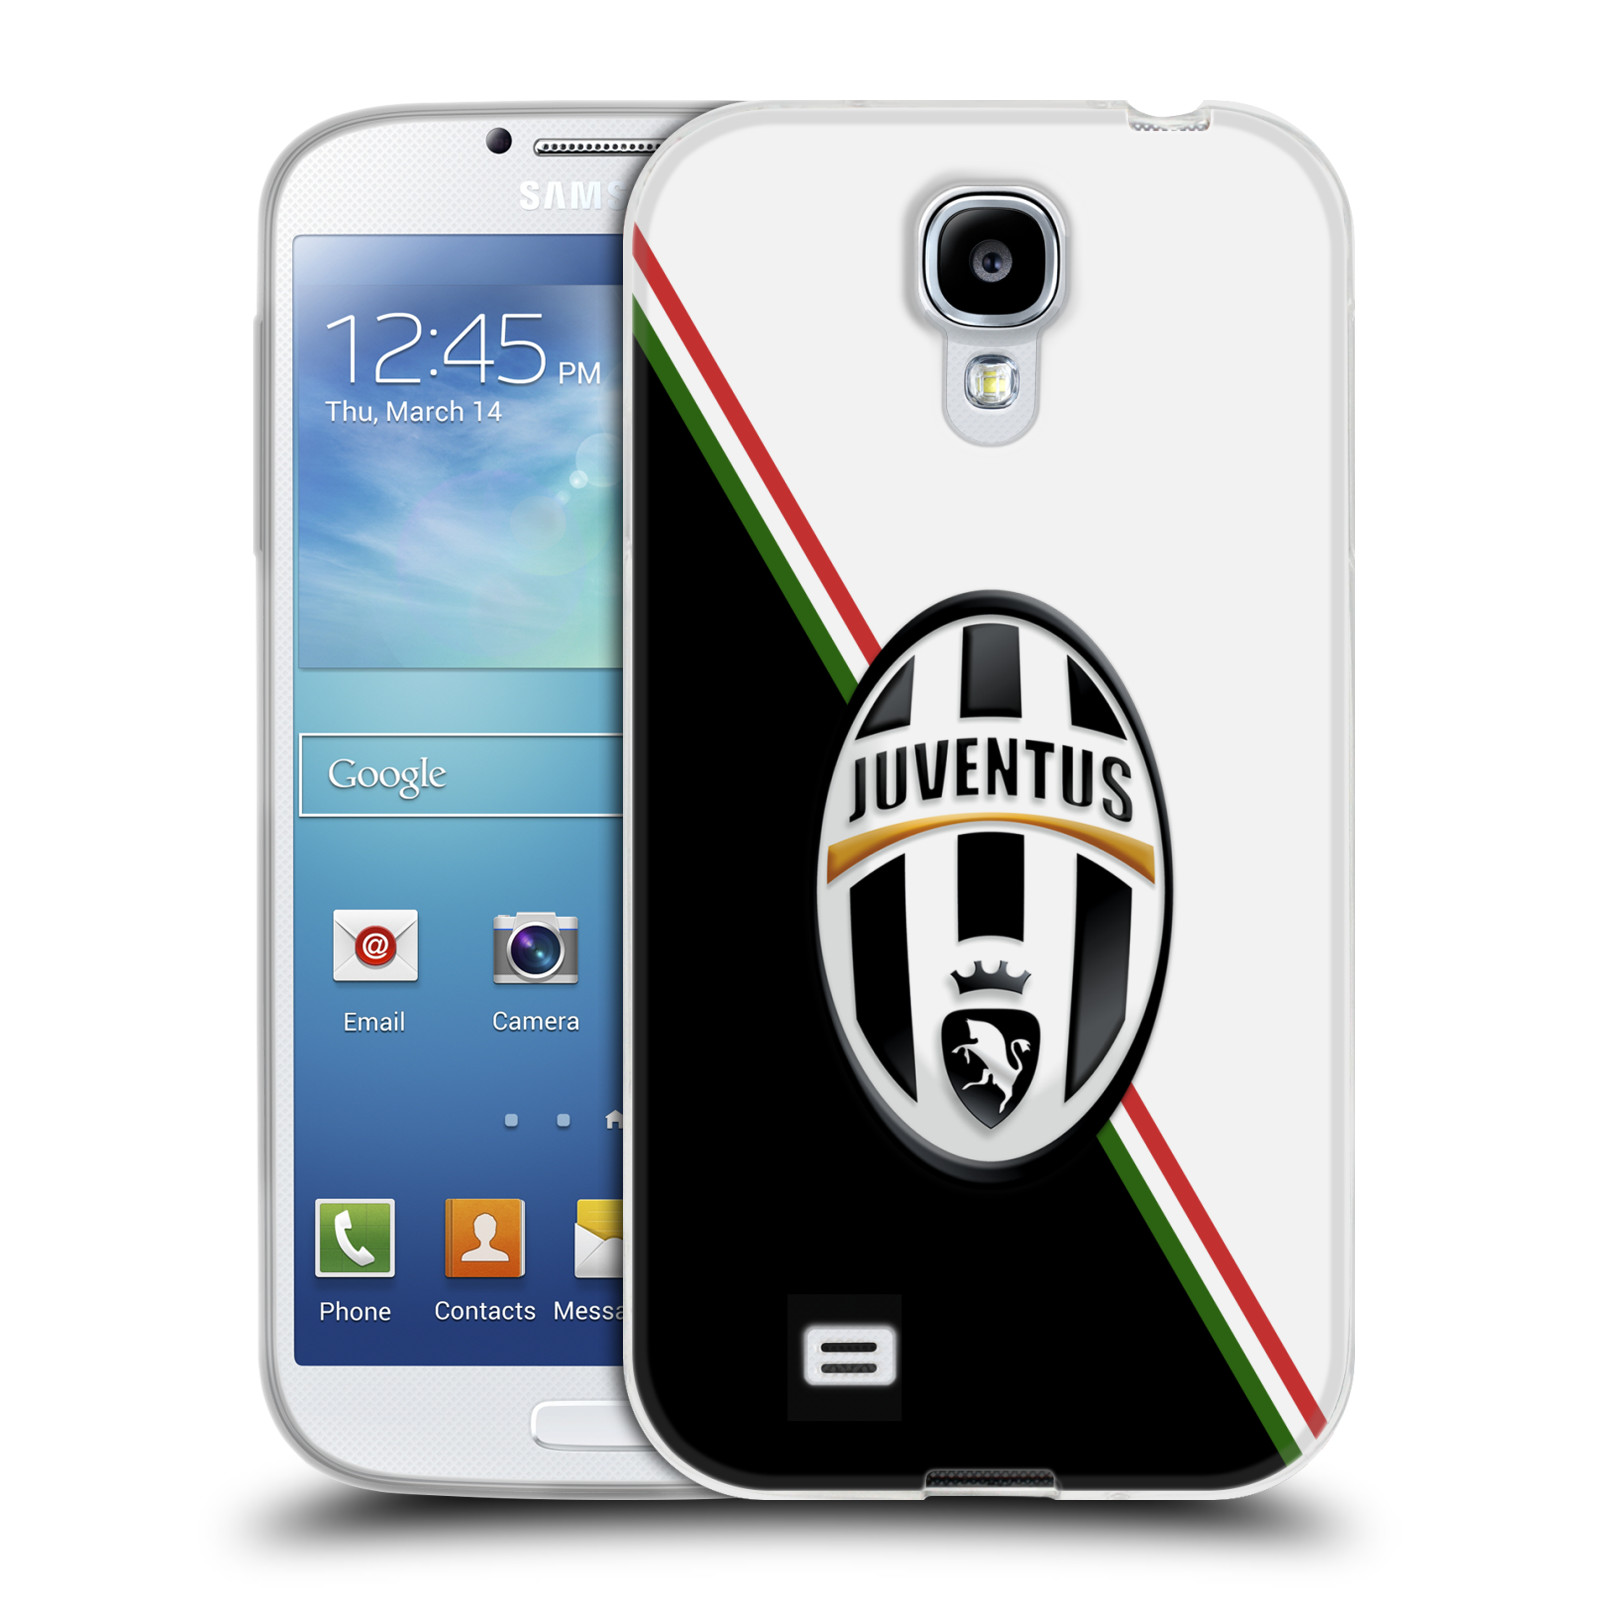 Silikonové pouzdro na mobil Samsung Galaxy S4 HEAD CASE Juventus FC - Black and White (Silikonový kryt či obal na mobilní telefon Juventus FC Official pro Samsung Galaxy S4 GT-i9505 / i9500)